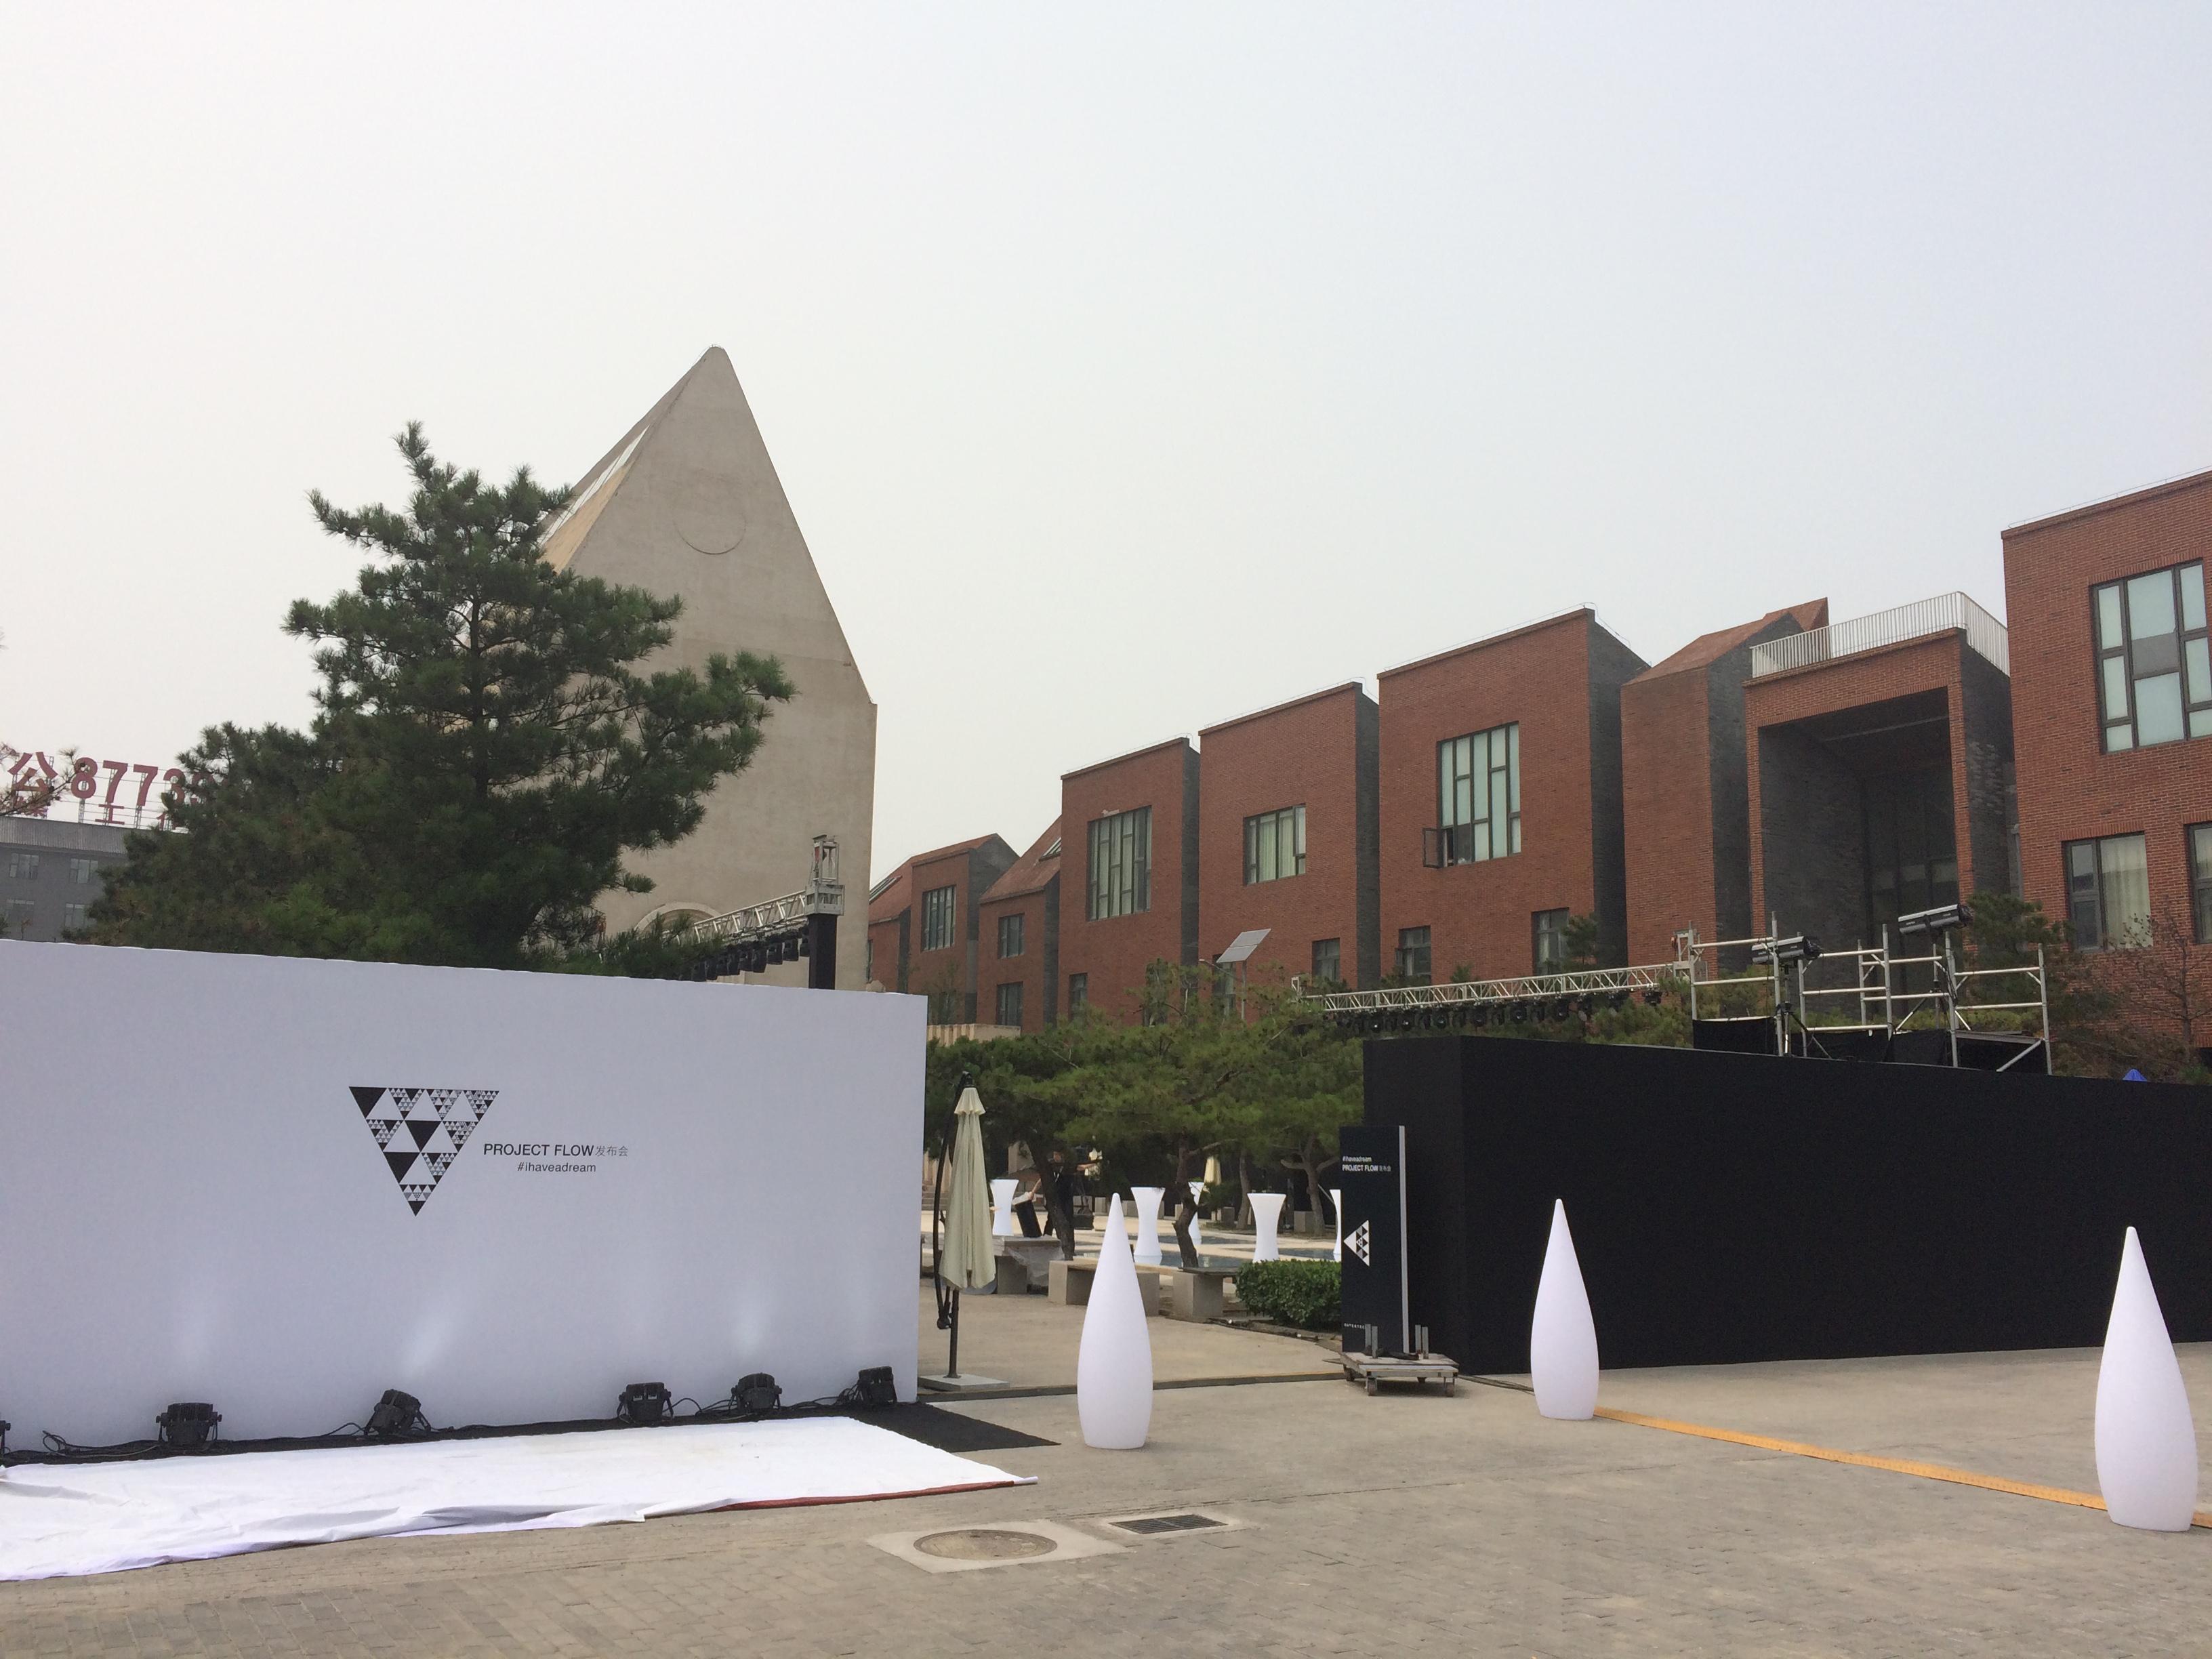 3D building shows in Beijing gaobeidian